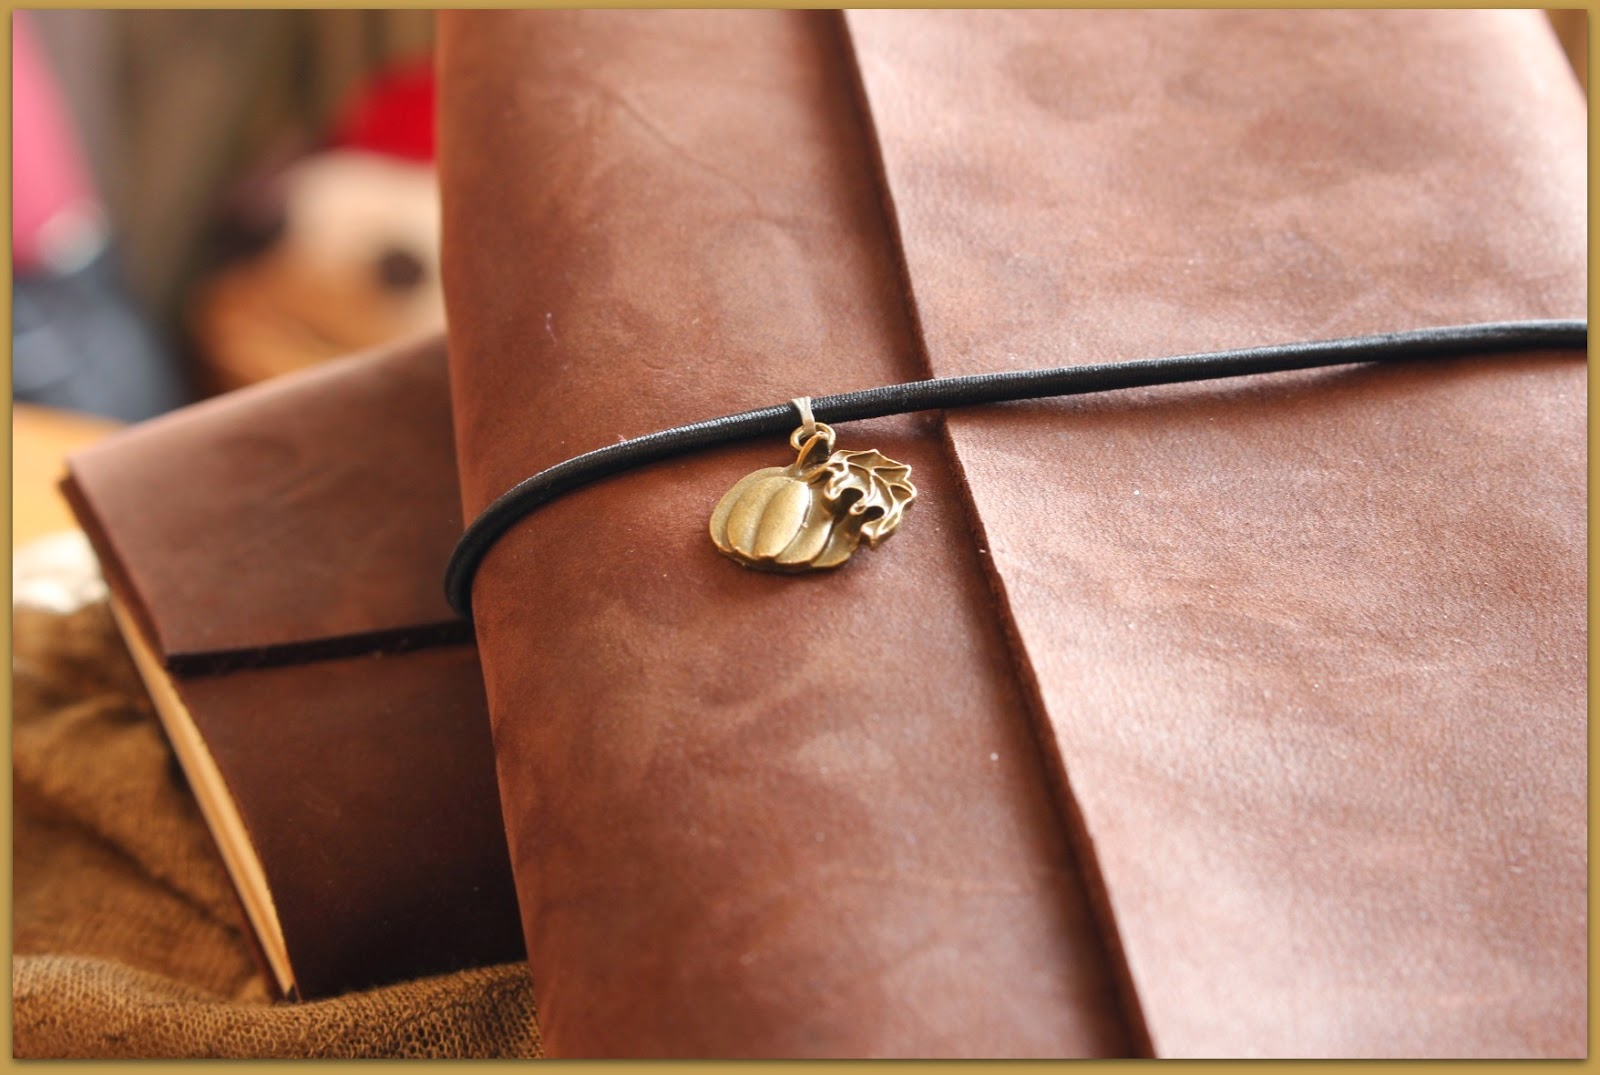 Midori fauxdori Travelers Notebook close up charm pumpkin